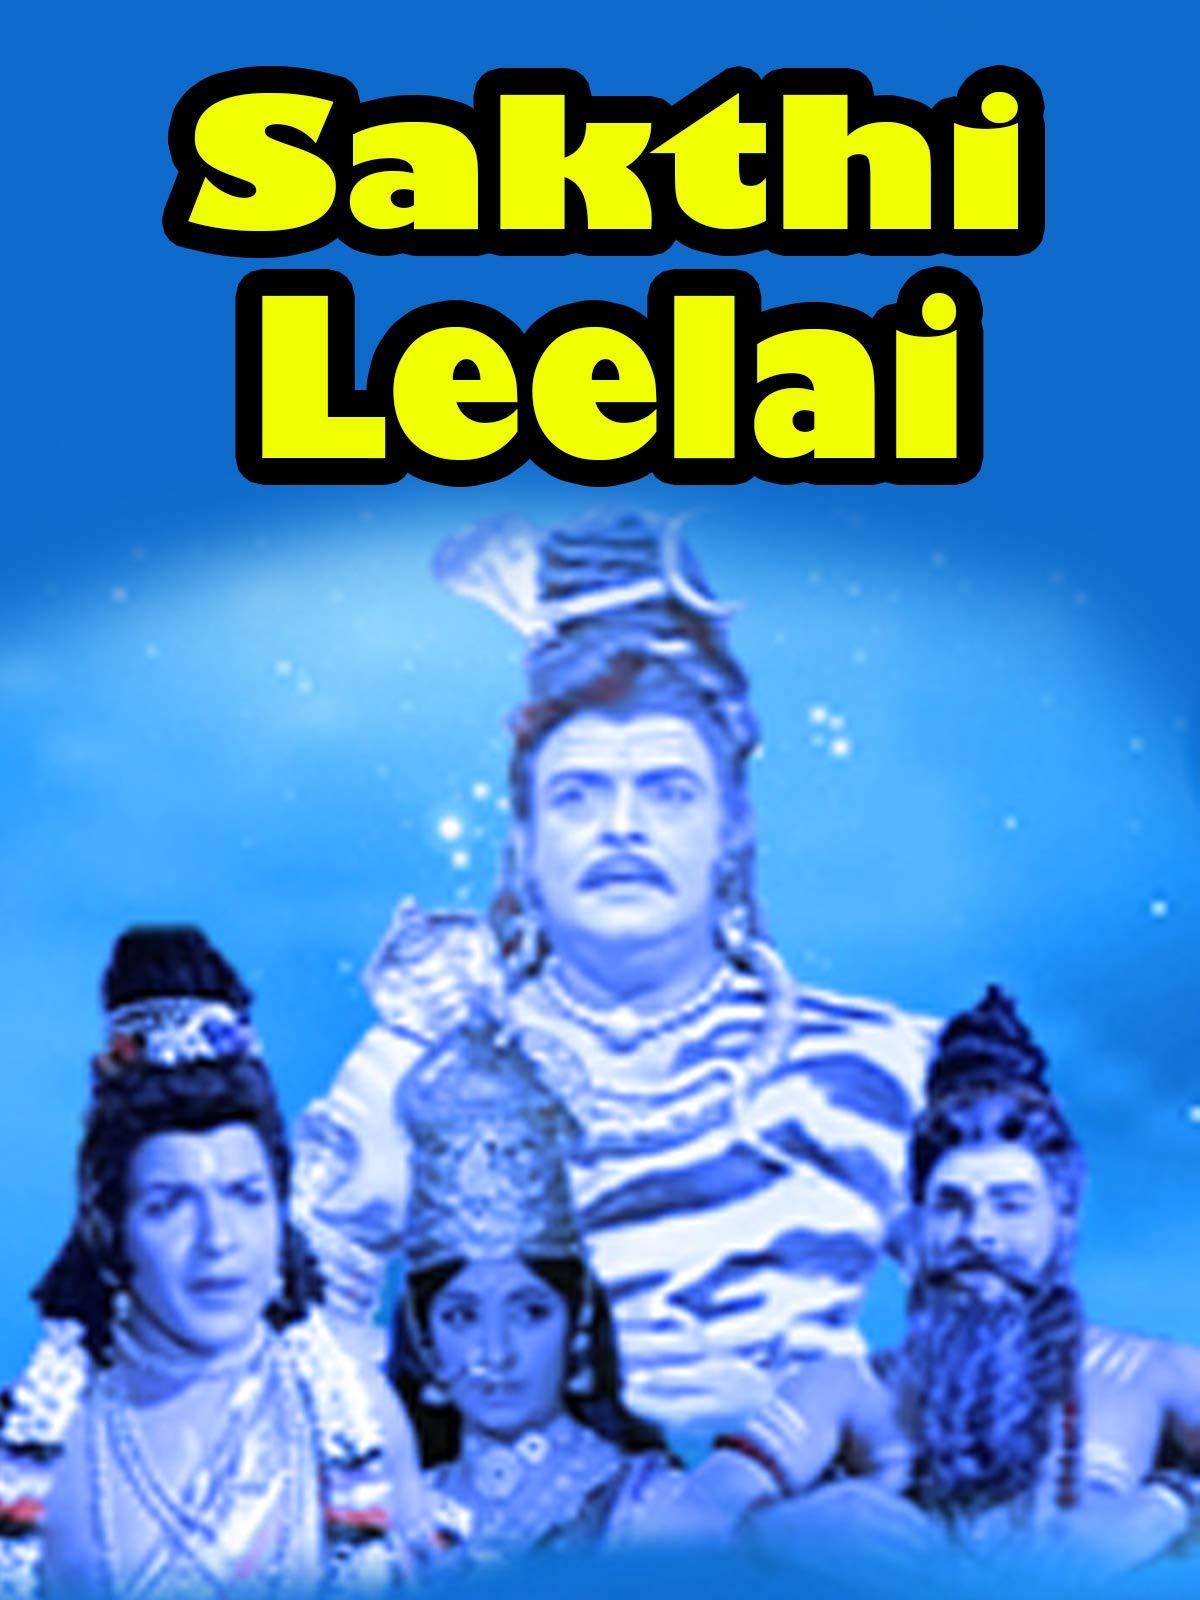 Shakthi Leelai